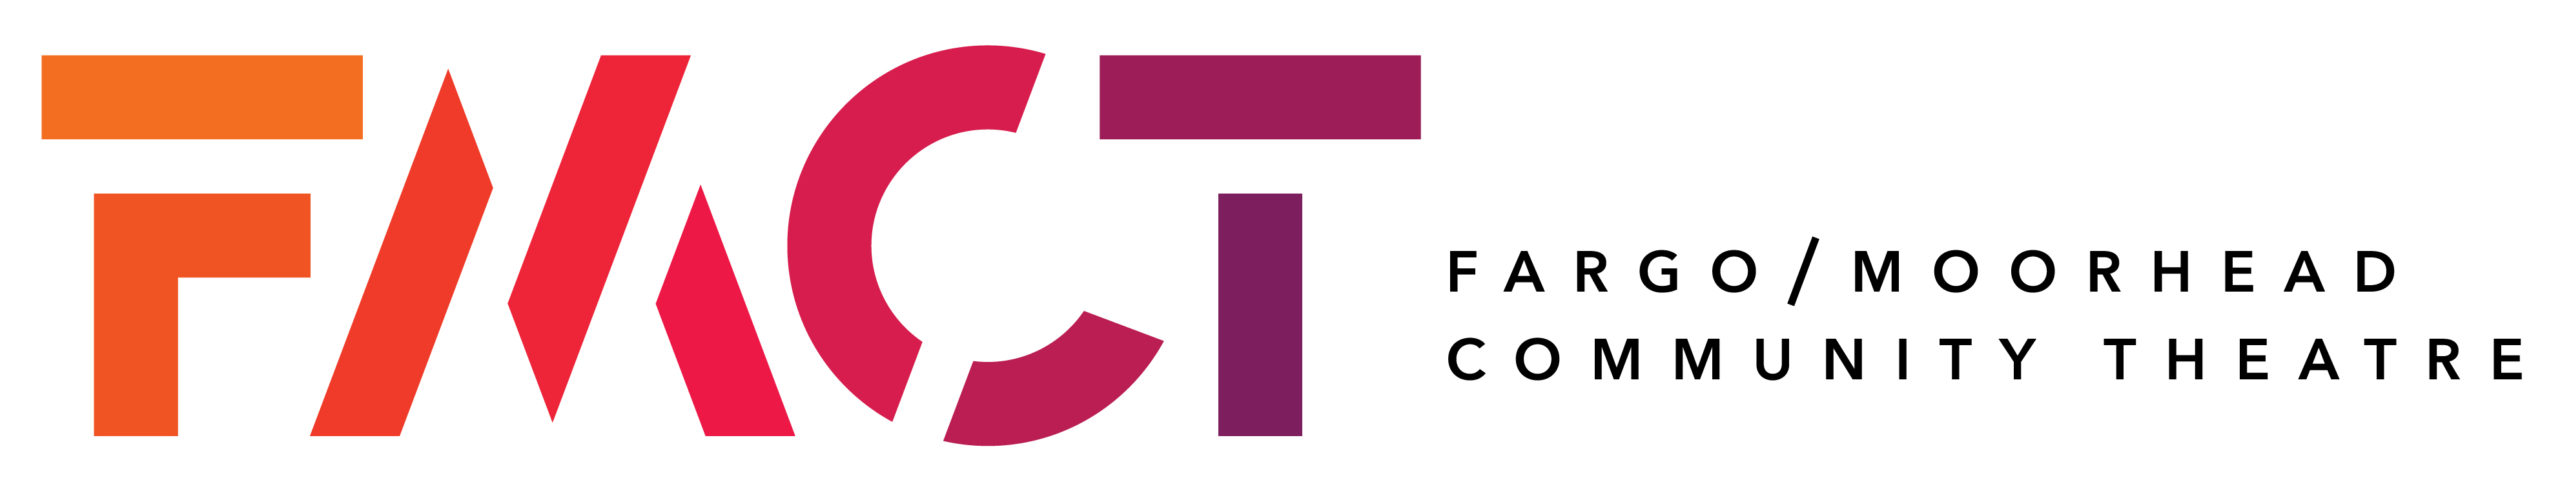 https://www.visionbanks.com/wp-content/uploads/FMCT-Logo_Horizontal_Full-Color-01-1-scaled.jpg